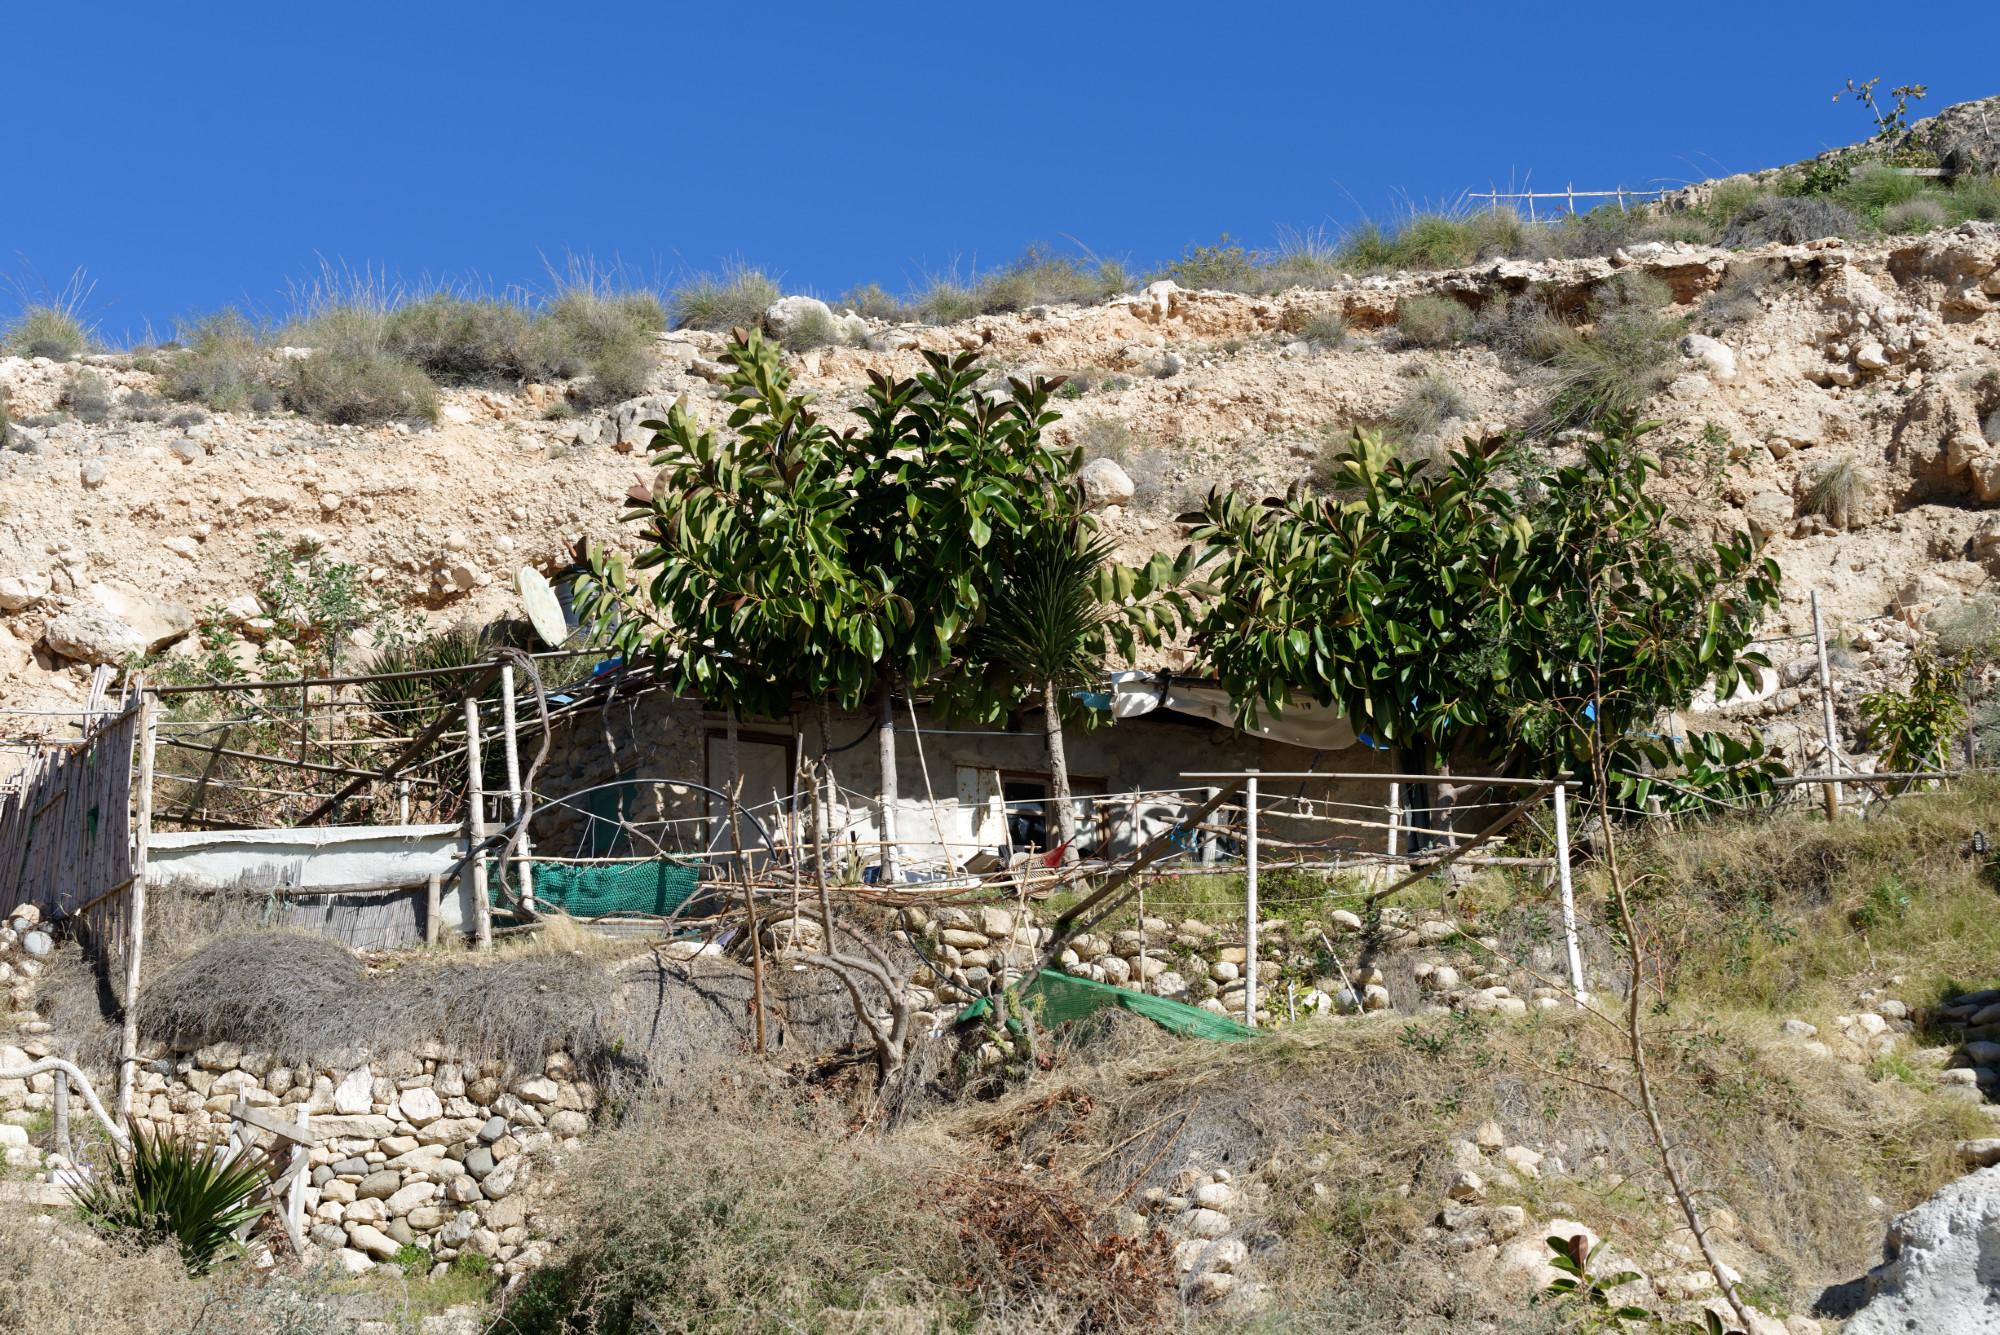 171213-Marche Las Negras-Cala San Pedro-Las Negras (66) (Cabo de Gata-Andalousie)